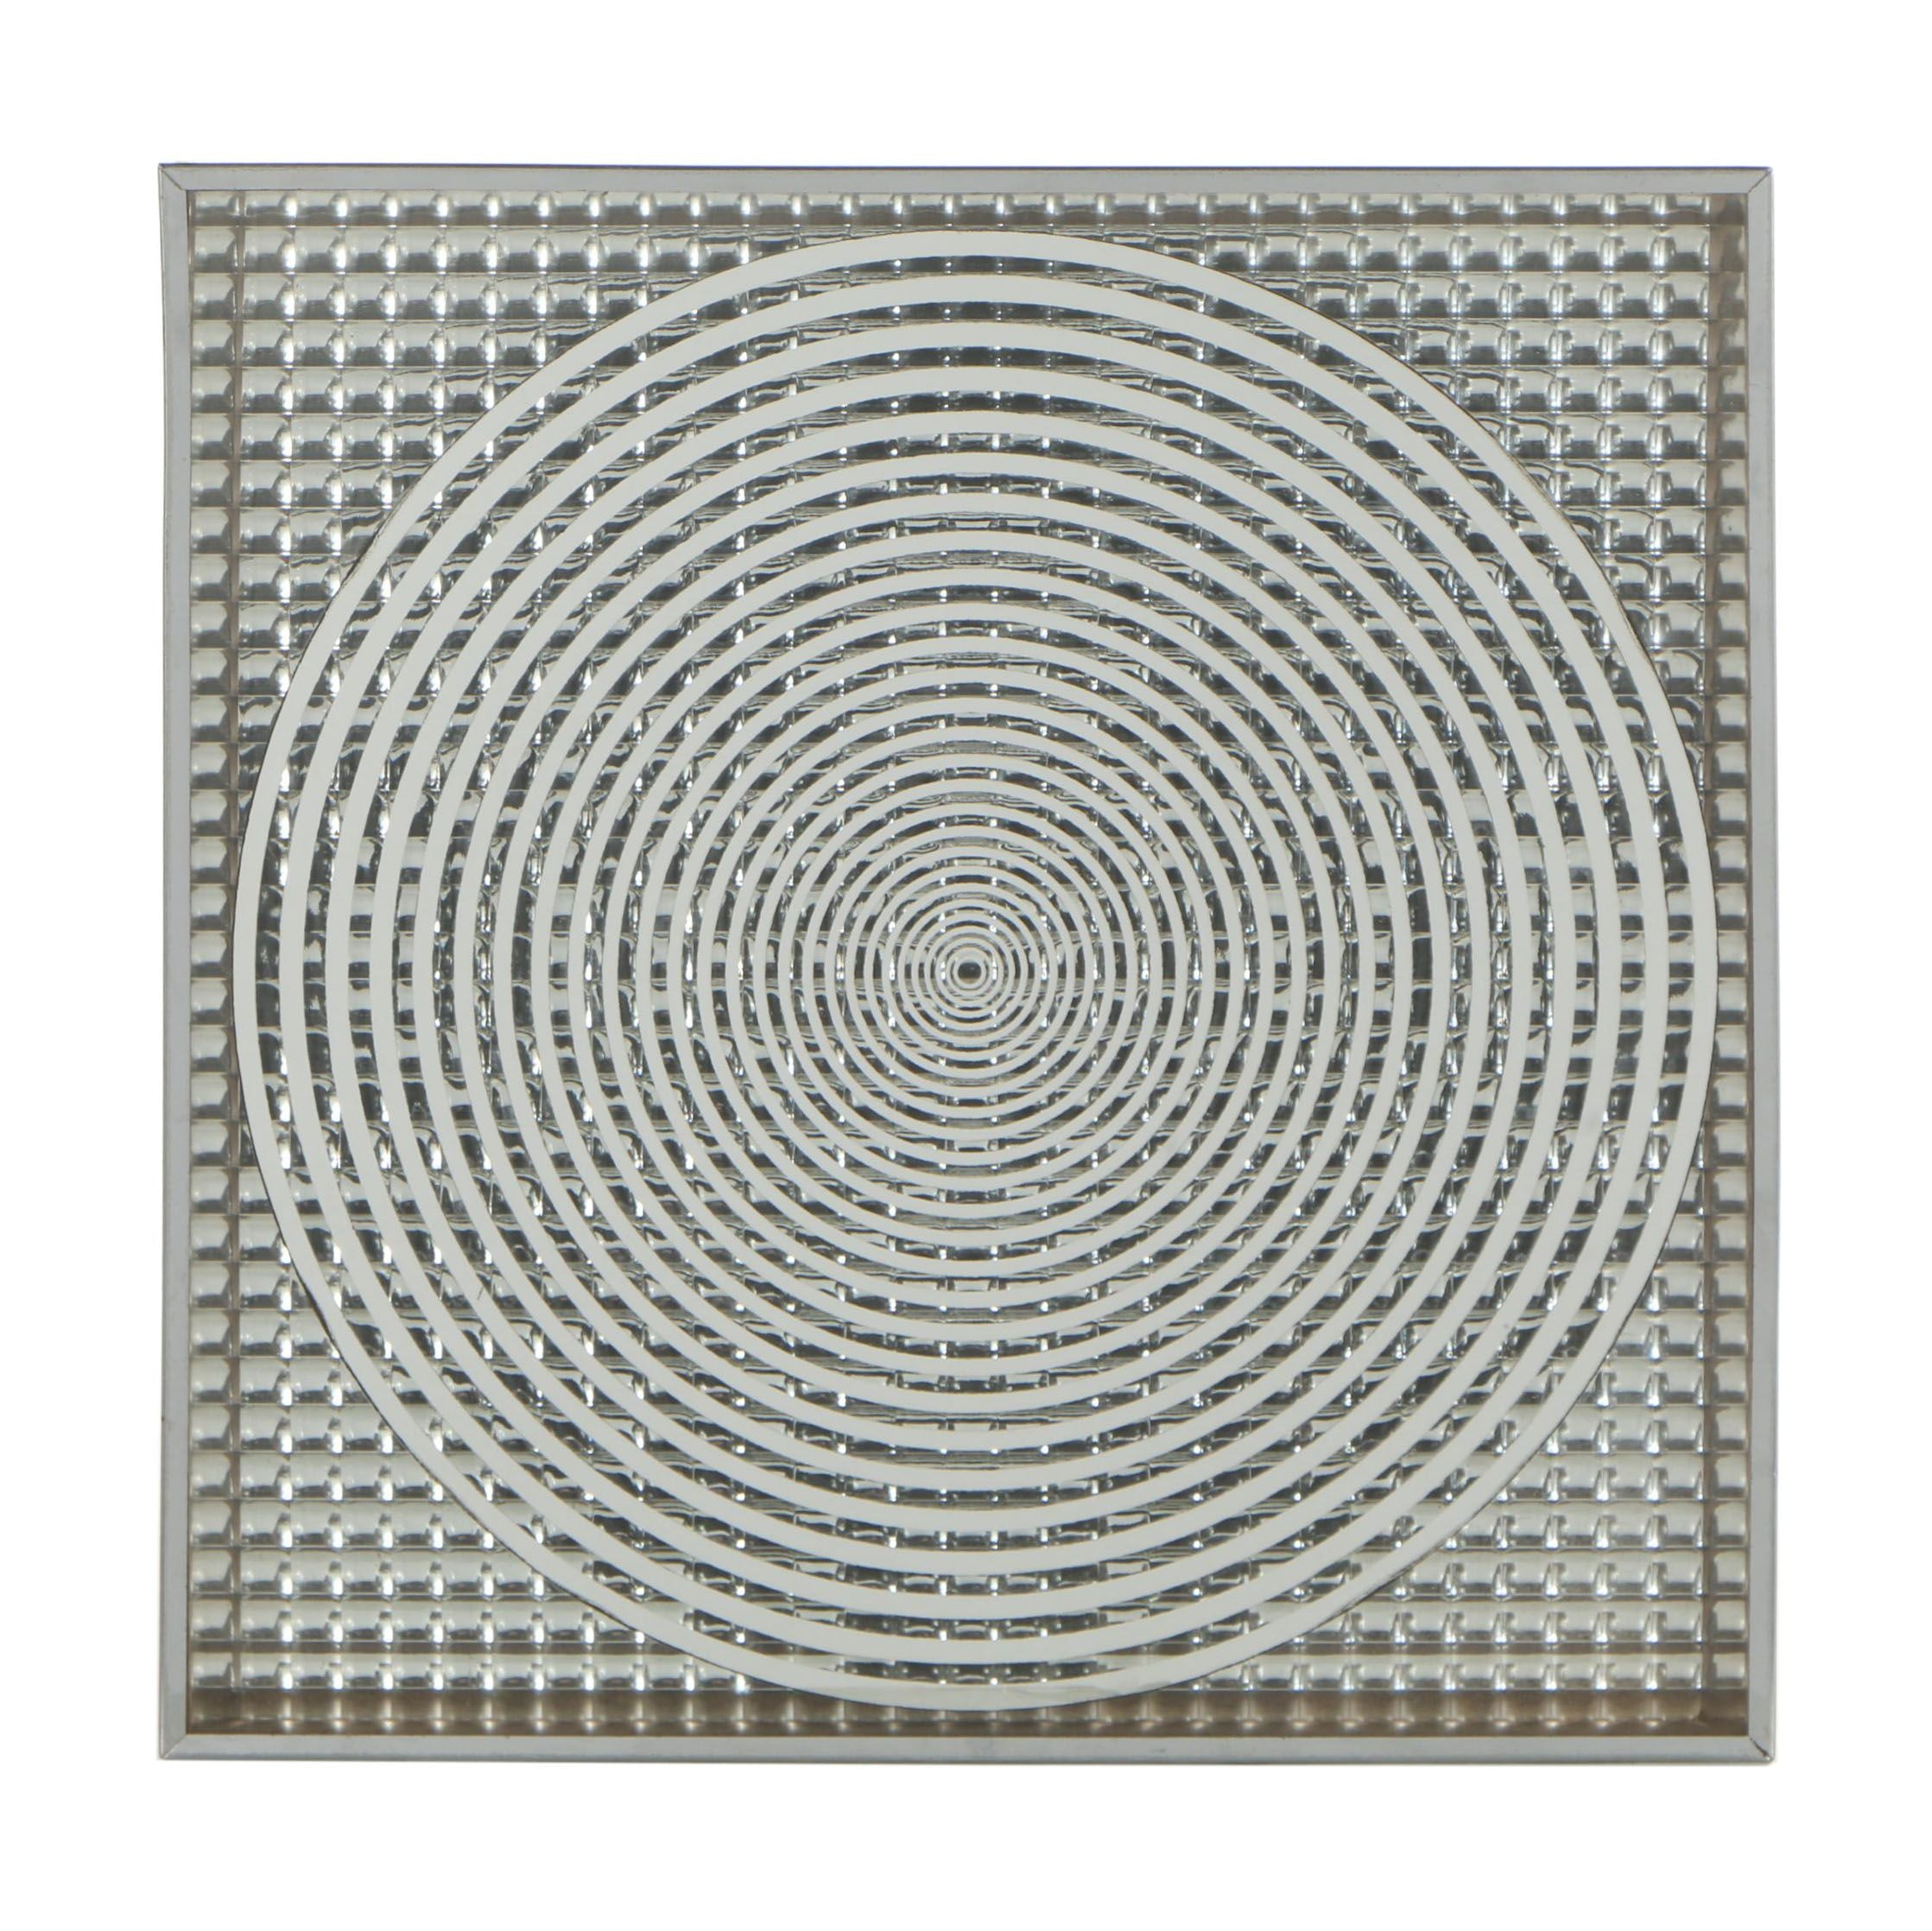 Mirrored Silver-Tone 3-D Op Art